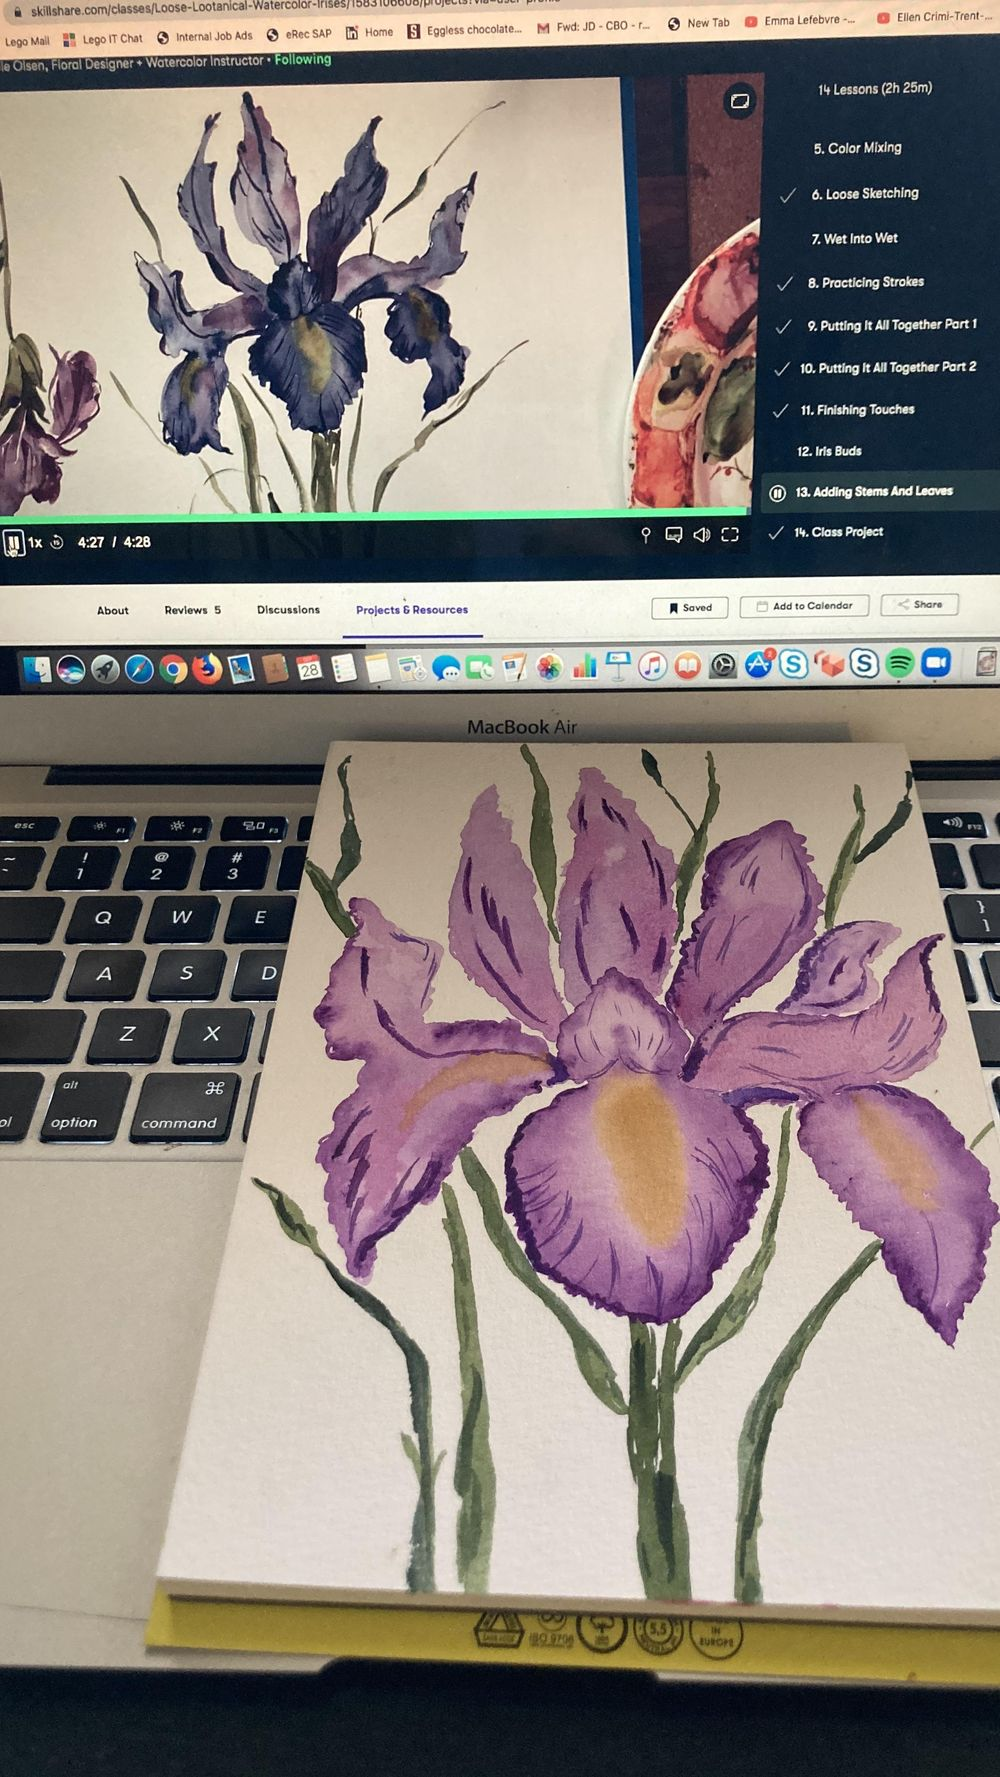 Lootanical Iris - image 1 - student project